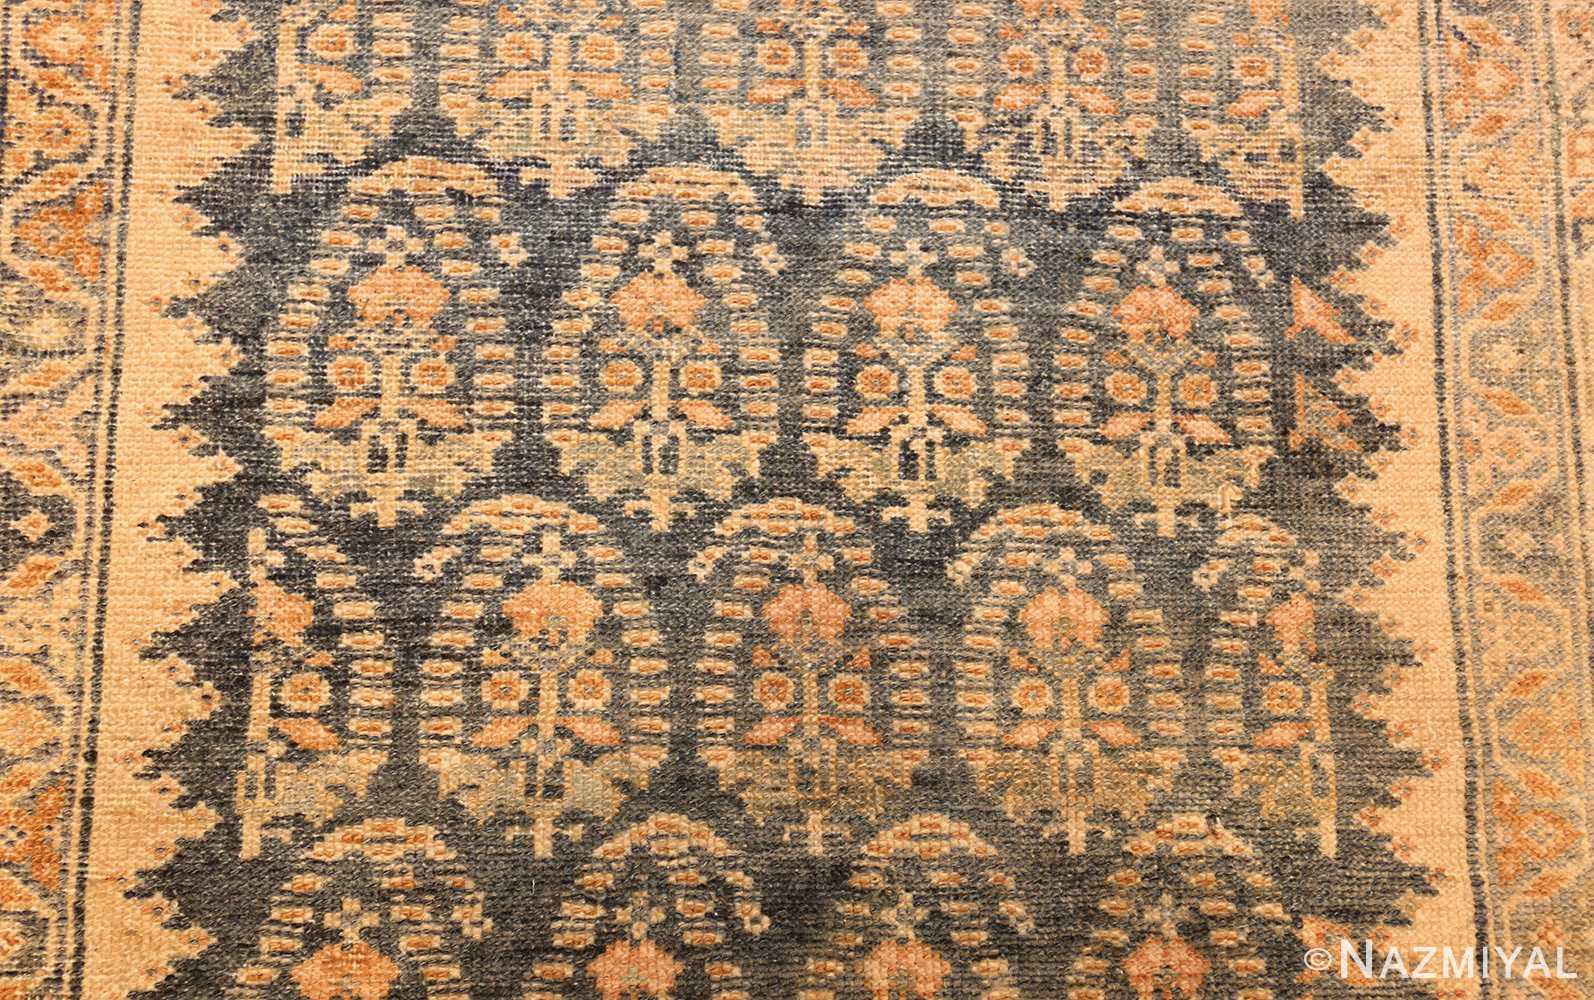 antique paisley design persian malayer runner rug 48824 field Nazmiyal